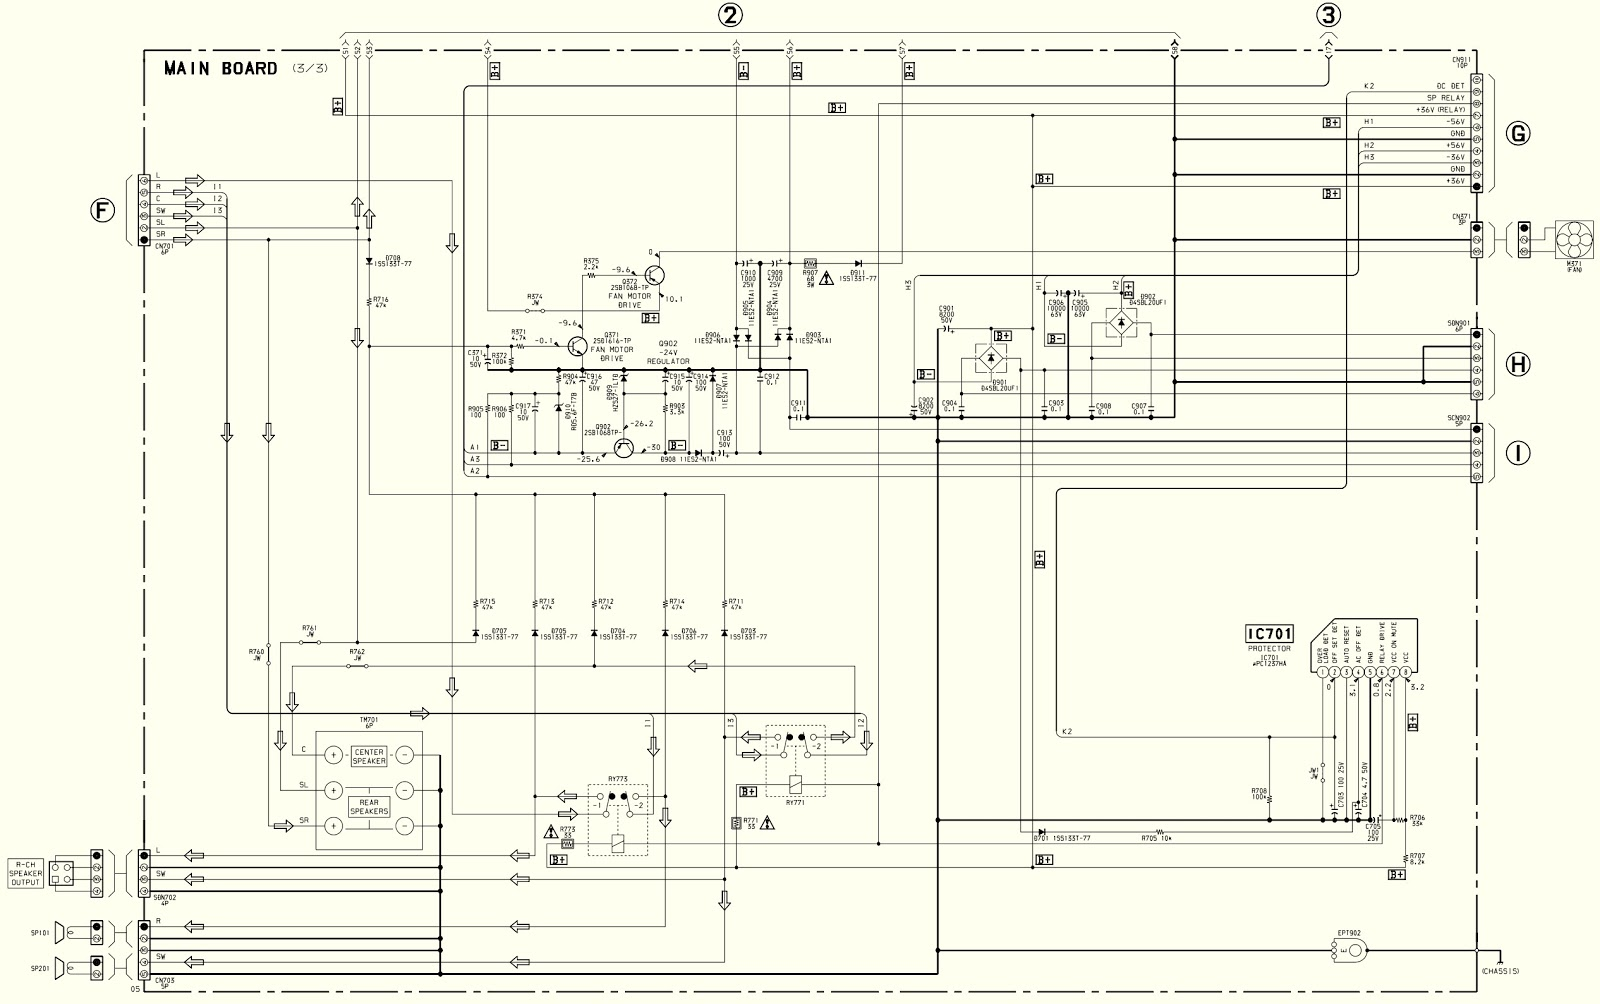 medium resolution of  sony sava 500 test mode schematic diagram home theater speaker home speaker wiring diagram